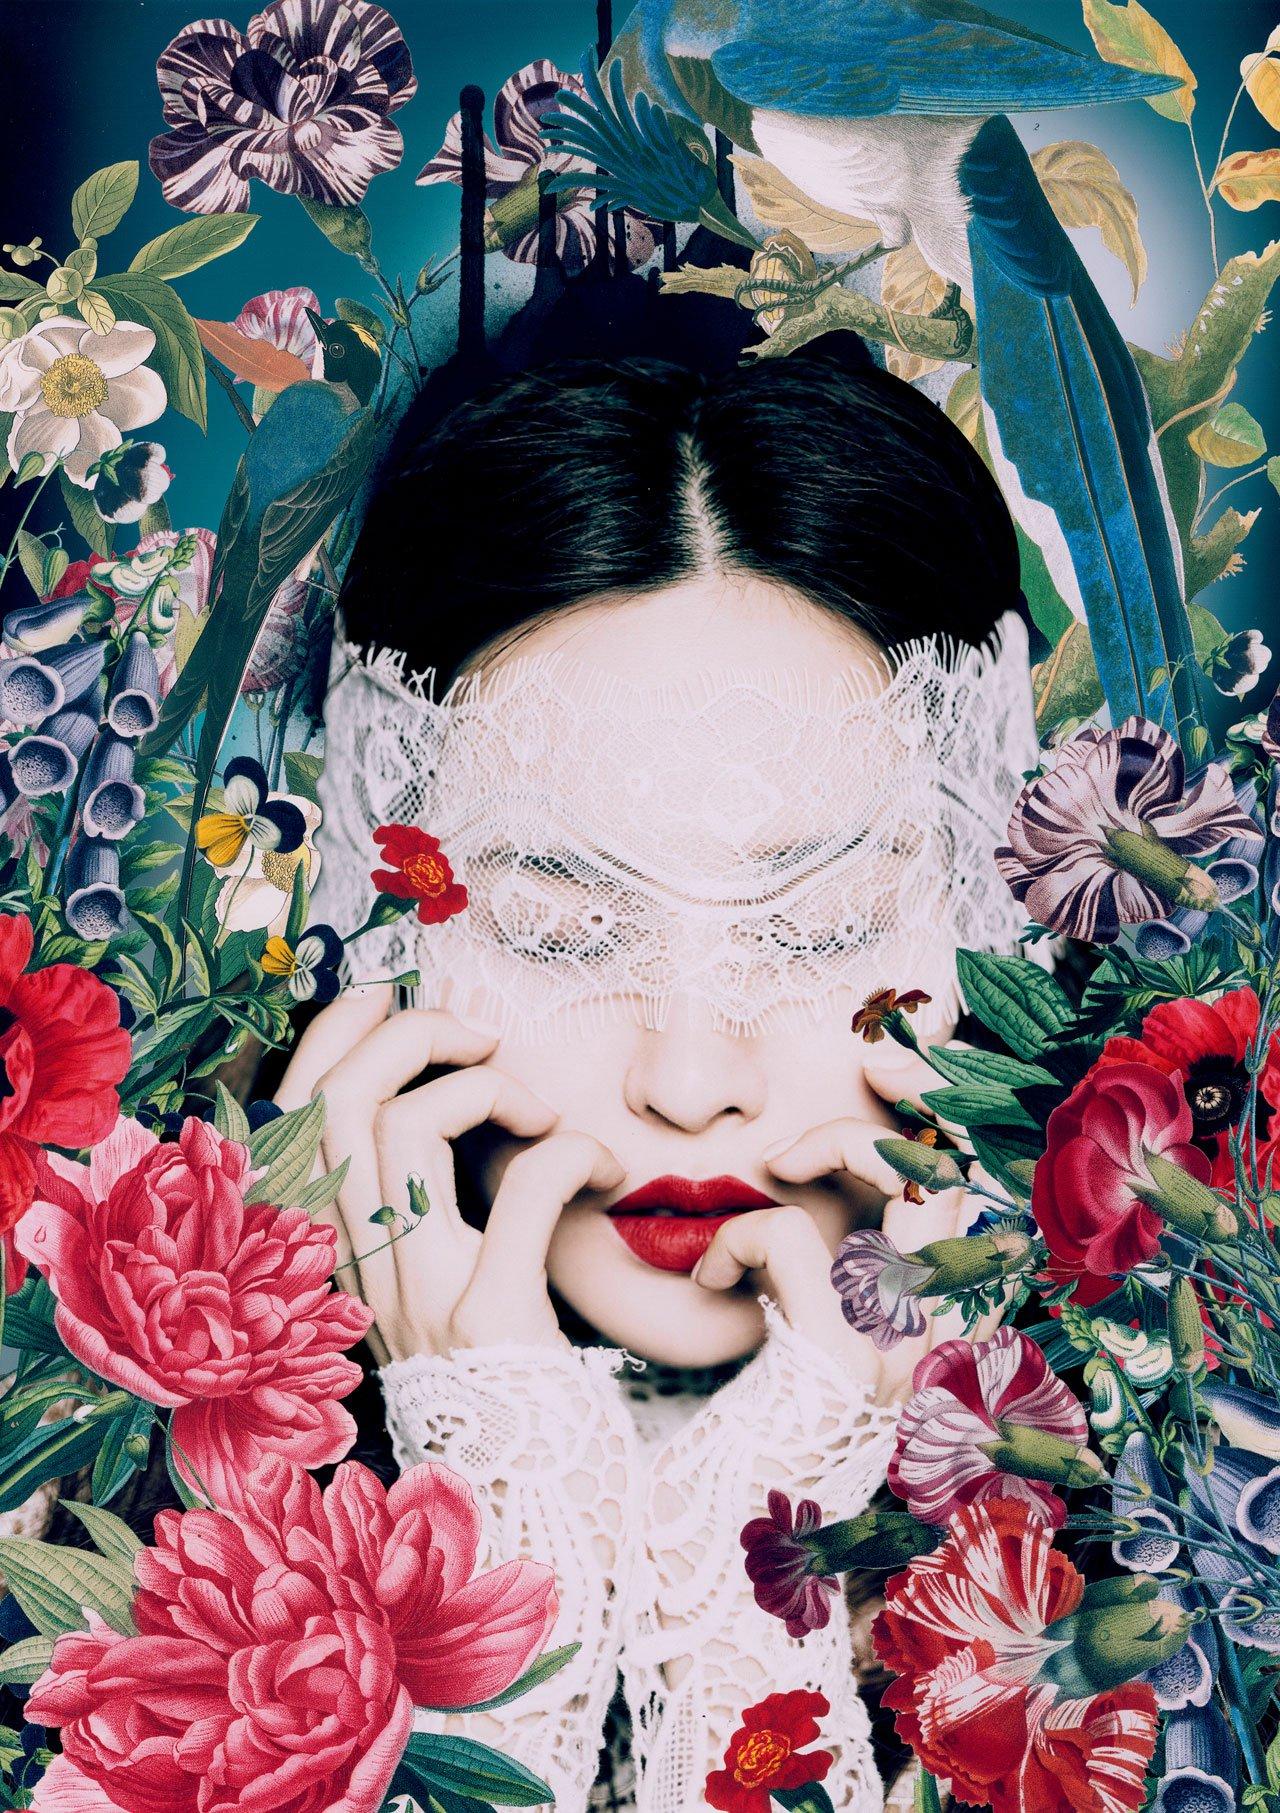 Artist: Alexandra Gallagher | Chasing Poppy